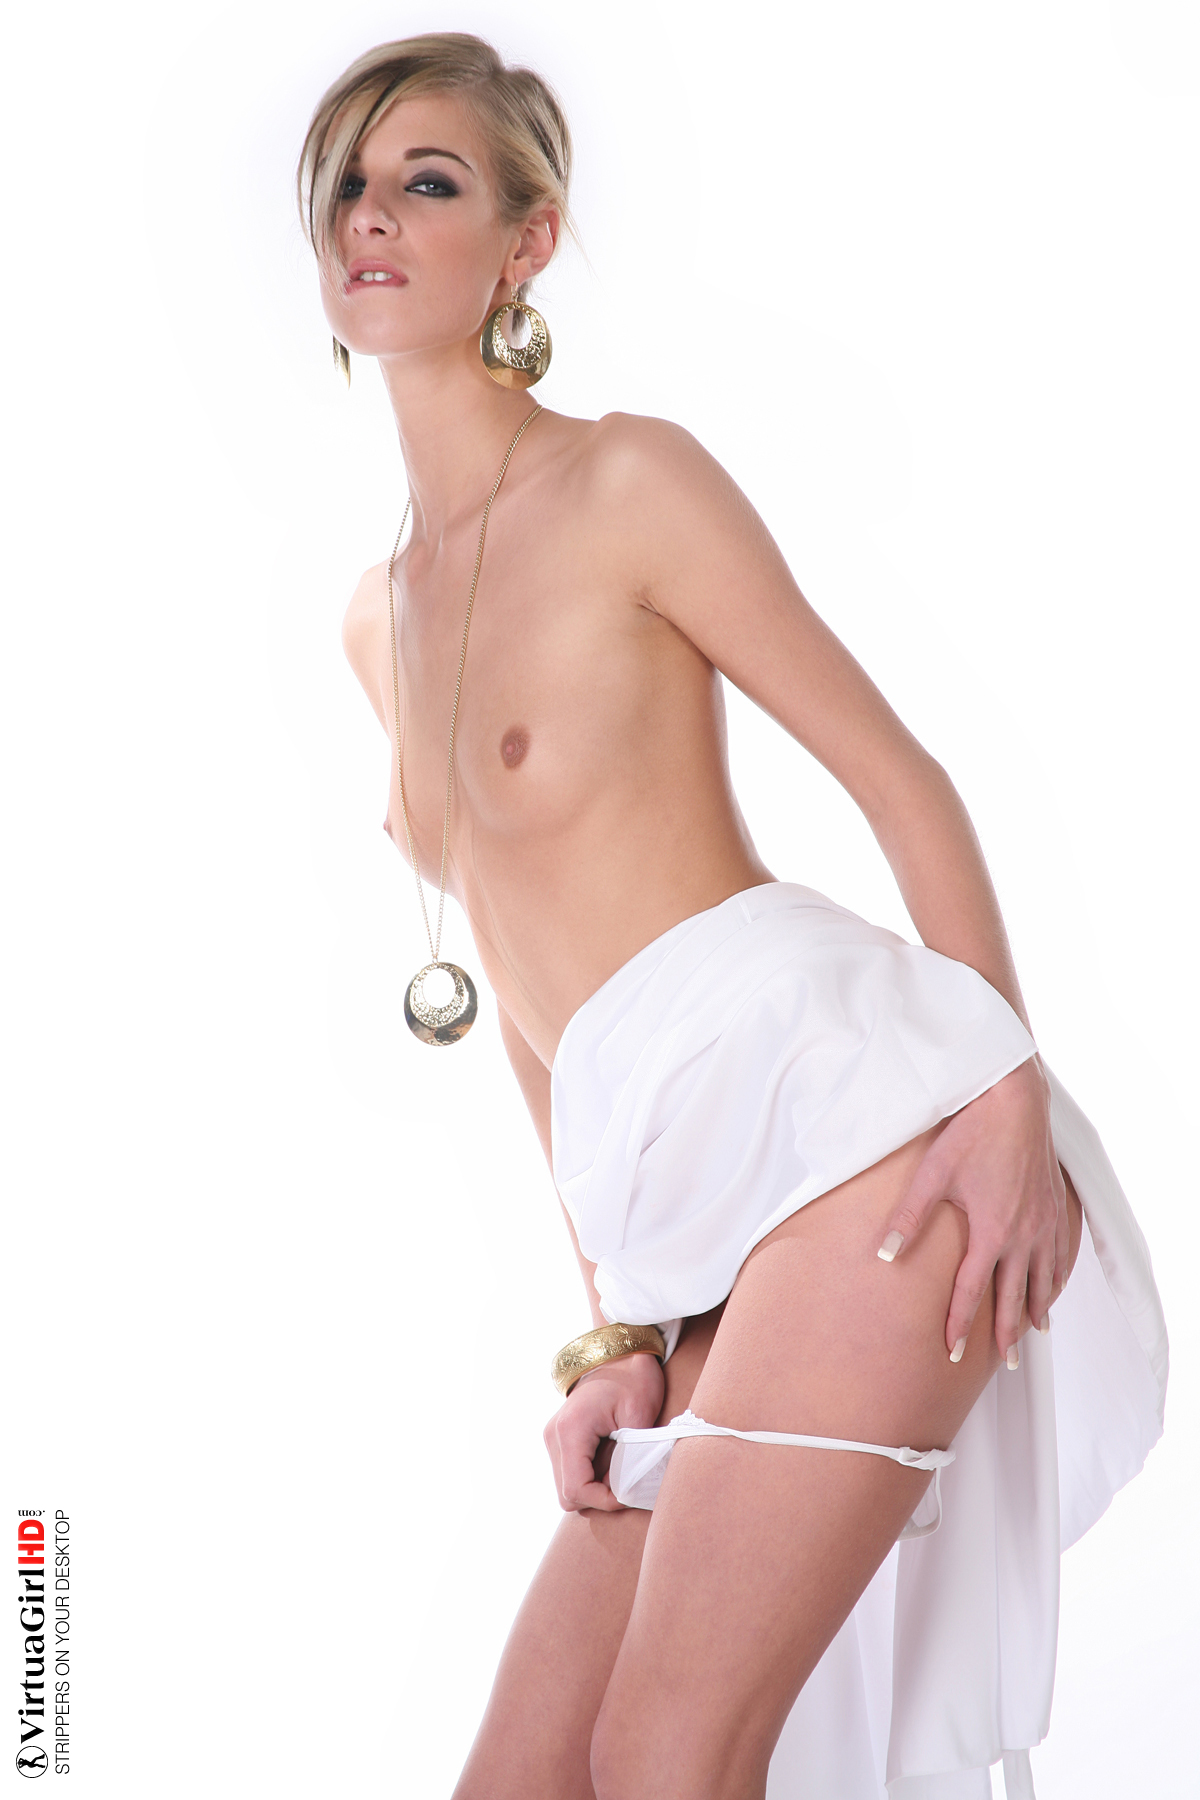 nude girls hd wallpapers